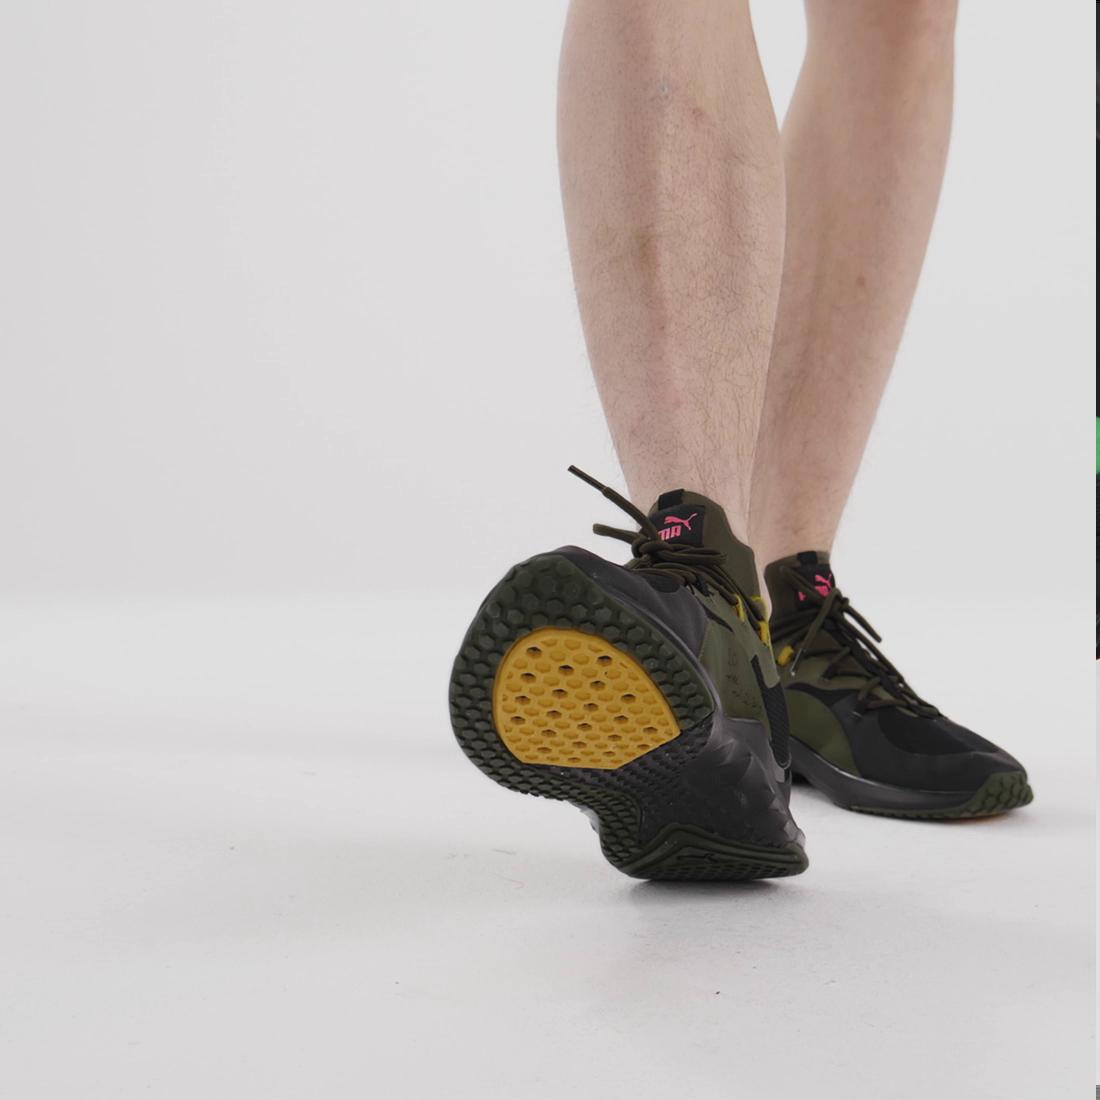 Image PUMA LQDCELL Hydra FM Camo Men's Training Shoes #8